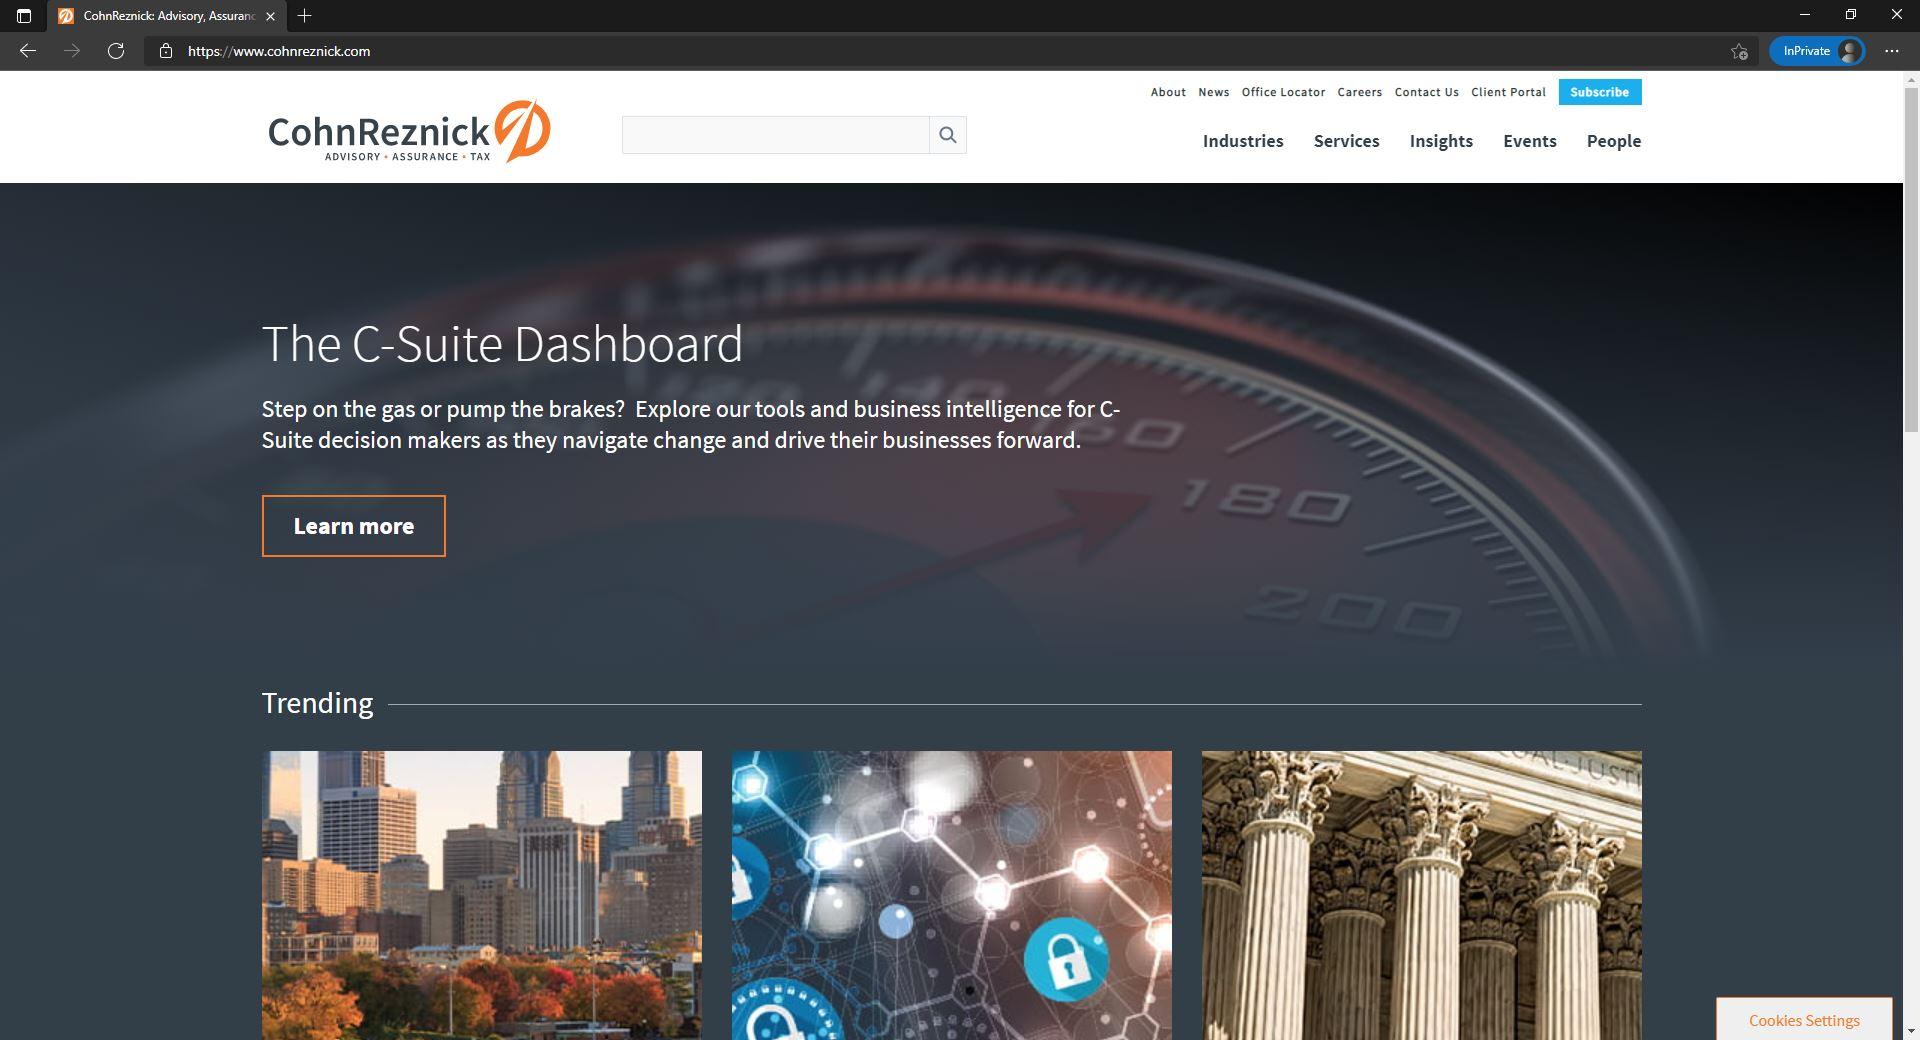 CohnReznick website homepage